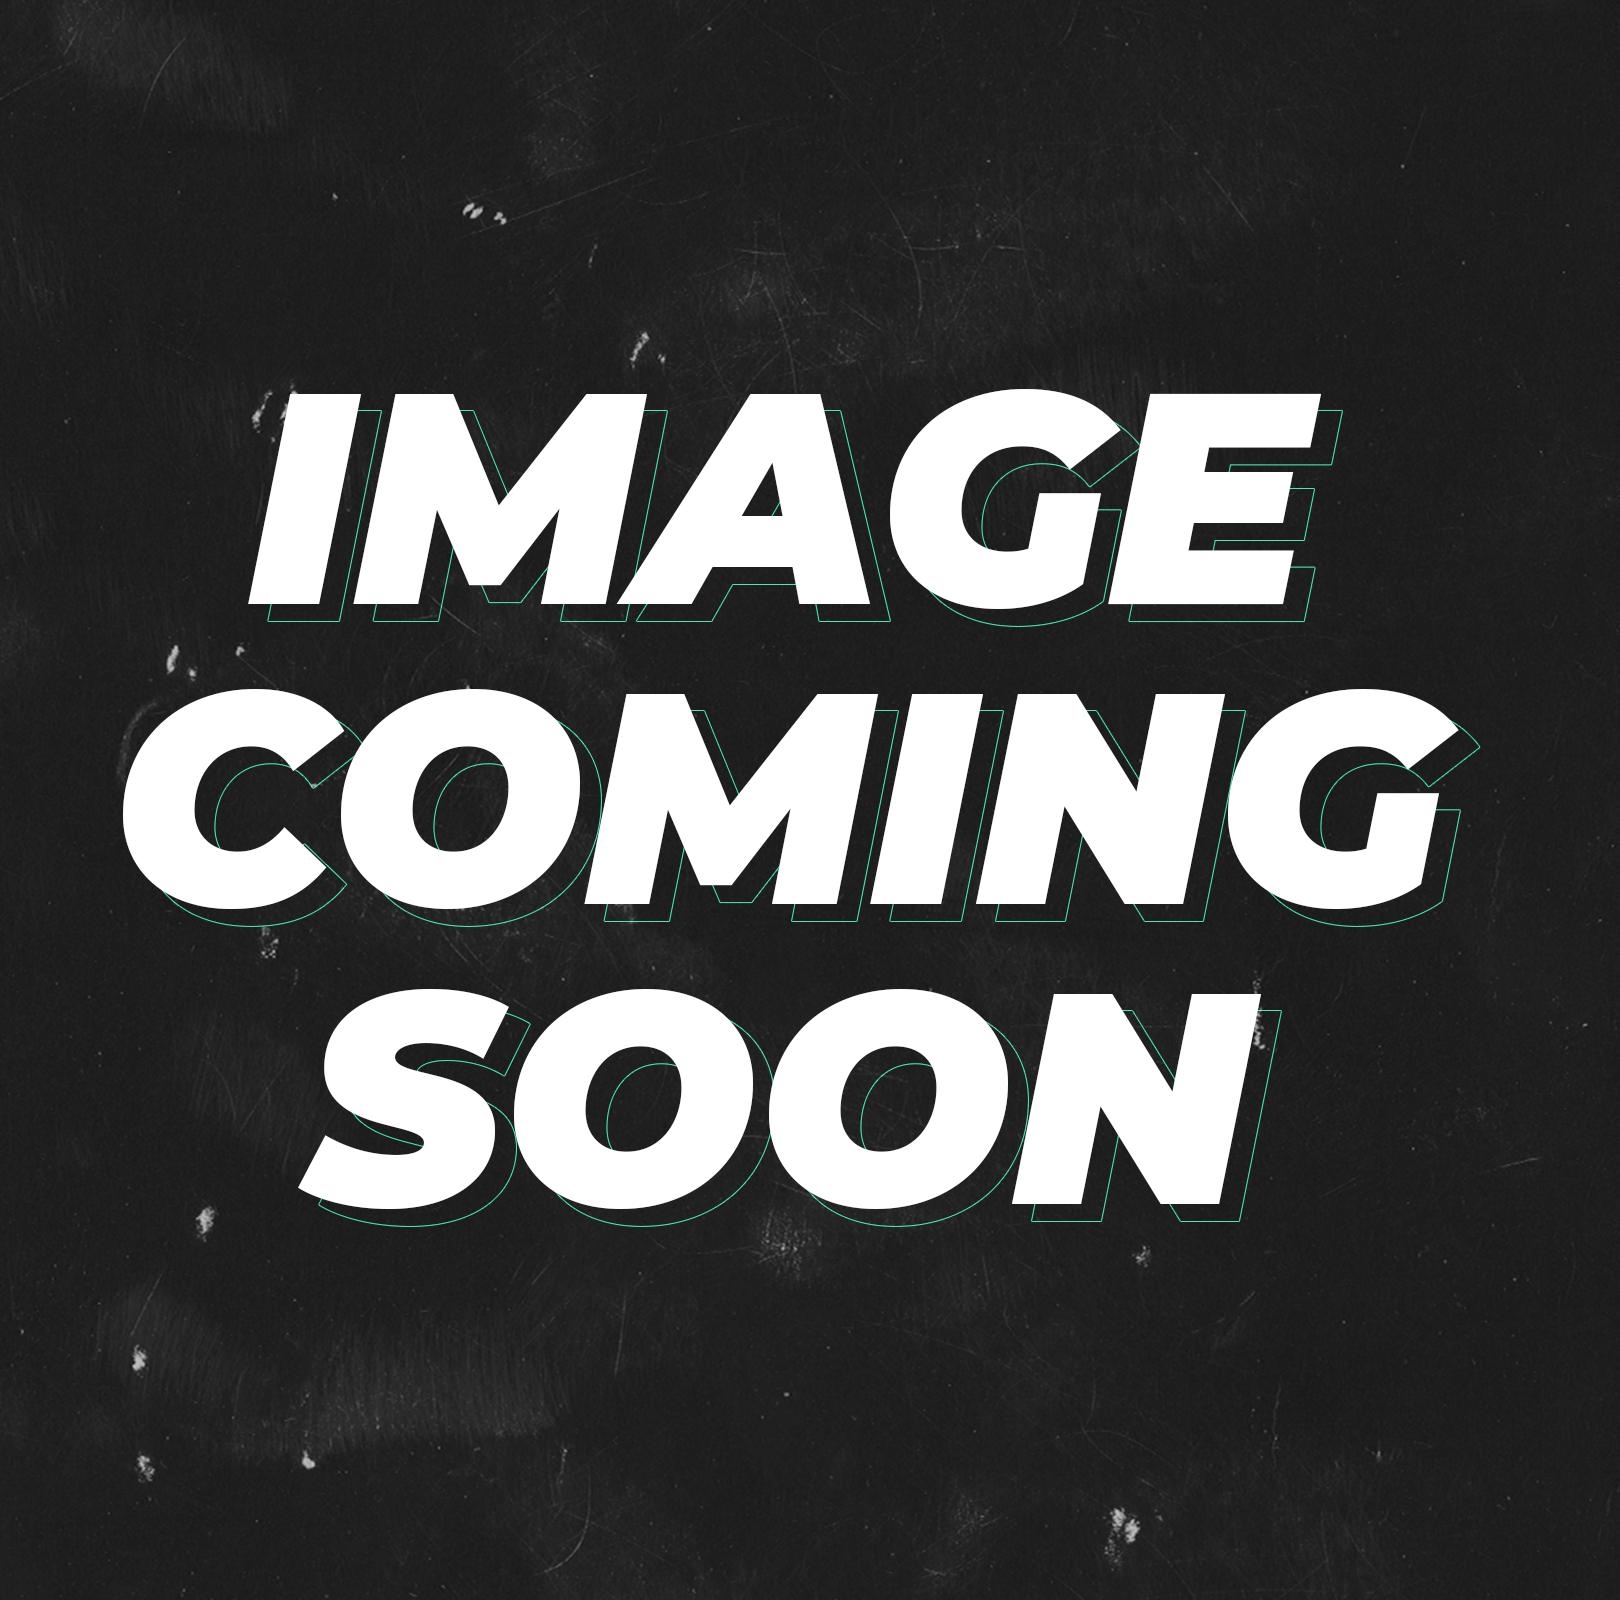 MPW Heavy Duty Motorbike Scooter Security Chain & Padlock - 1.5M